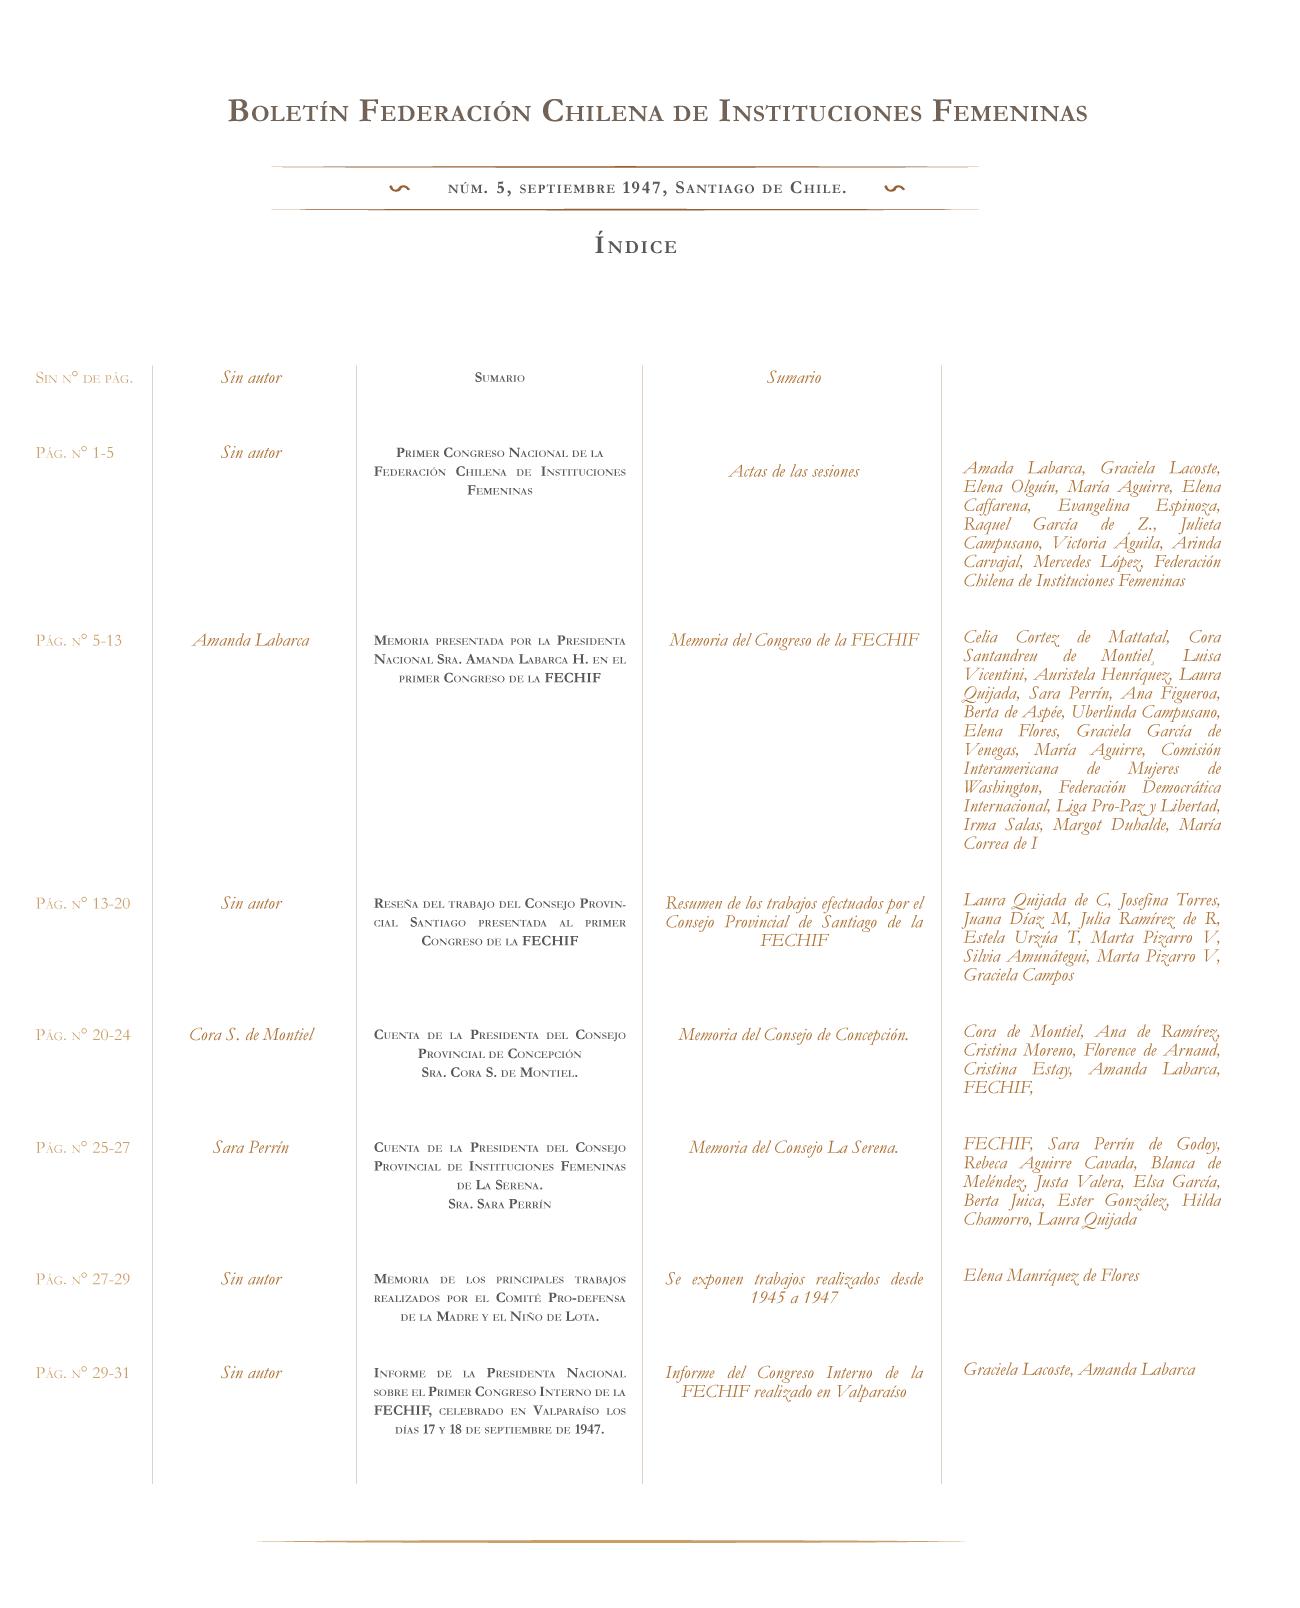 Boletín FECHIF Nº 5